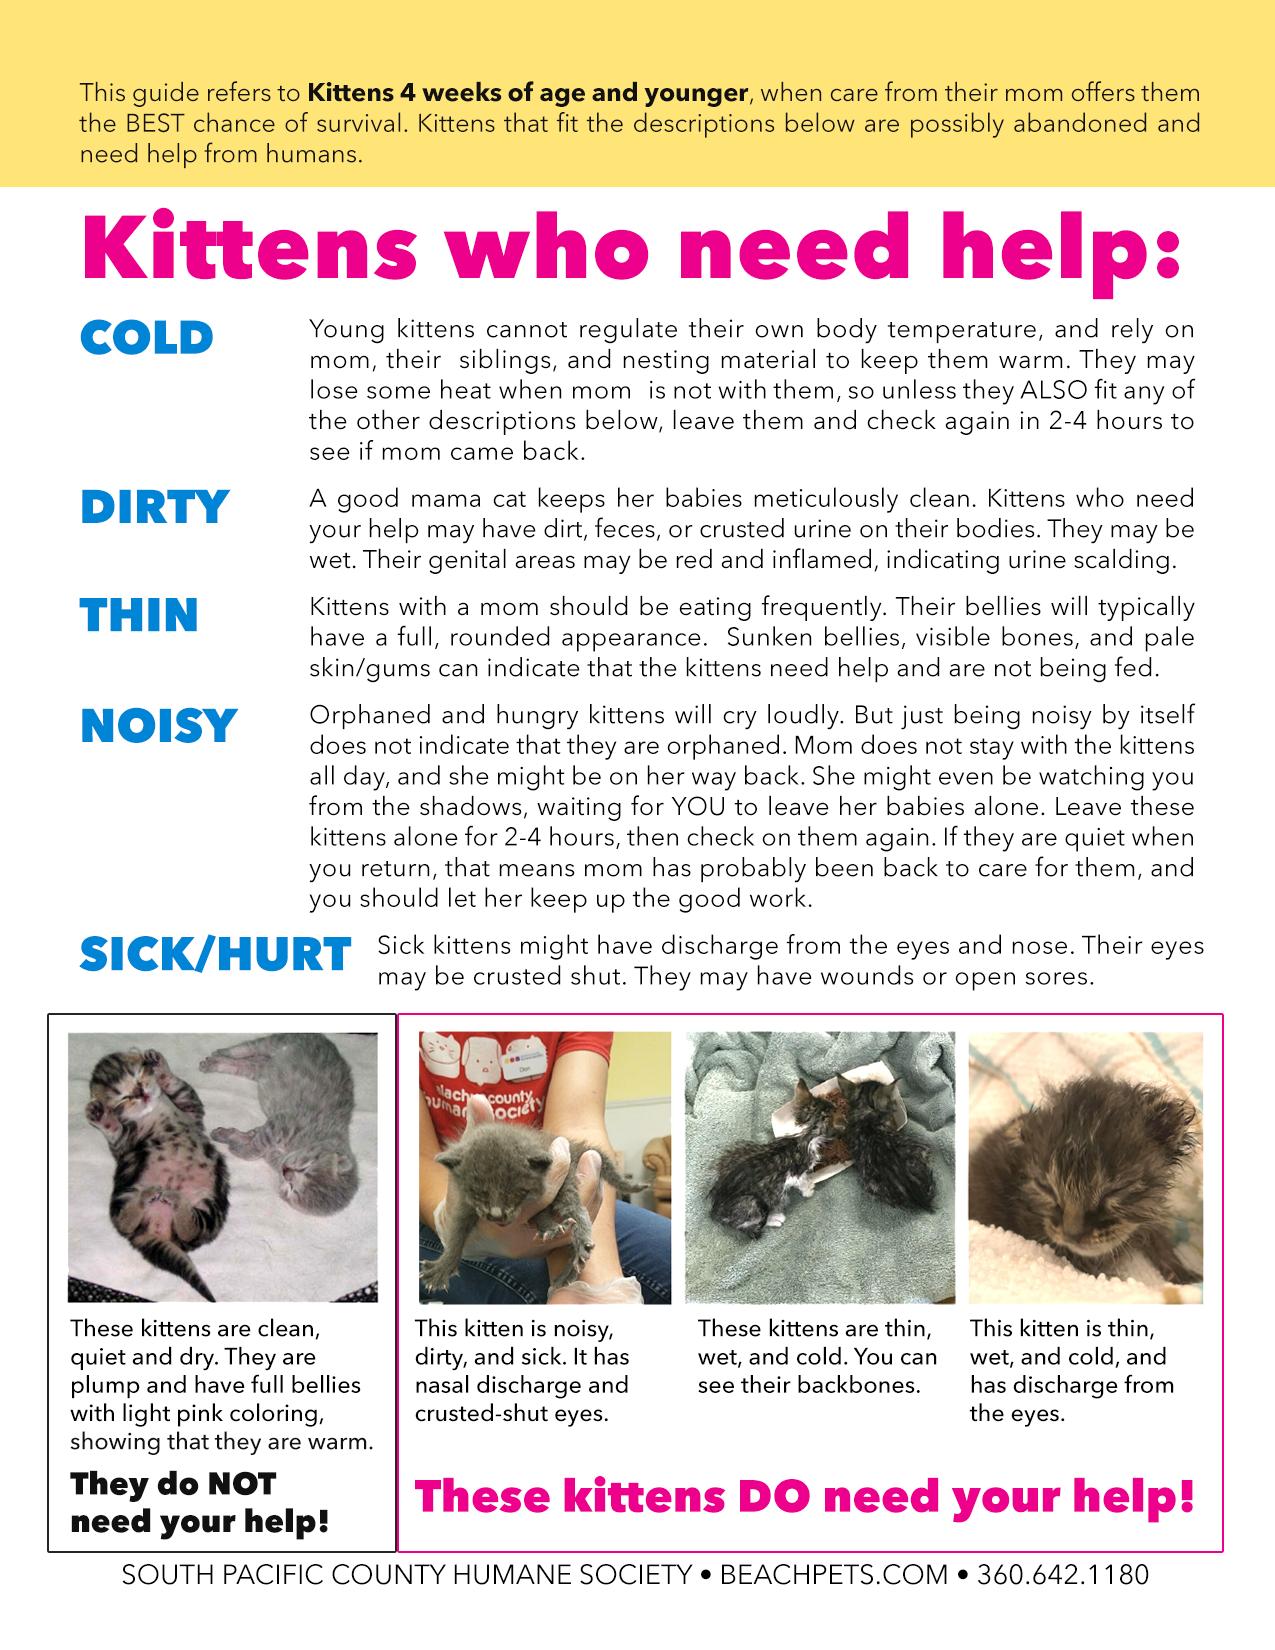 Kittens who need help